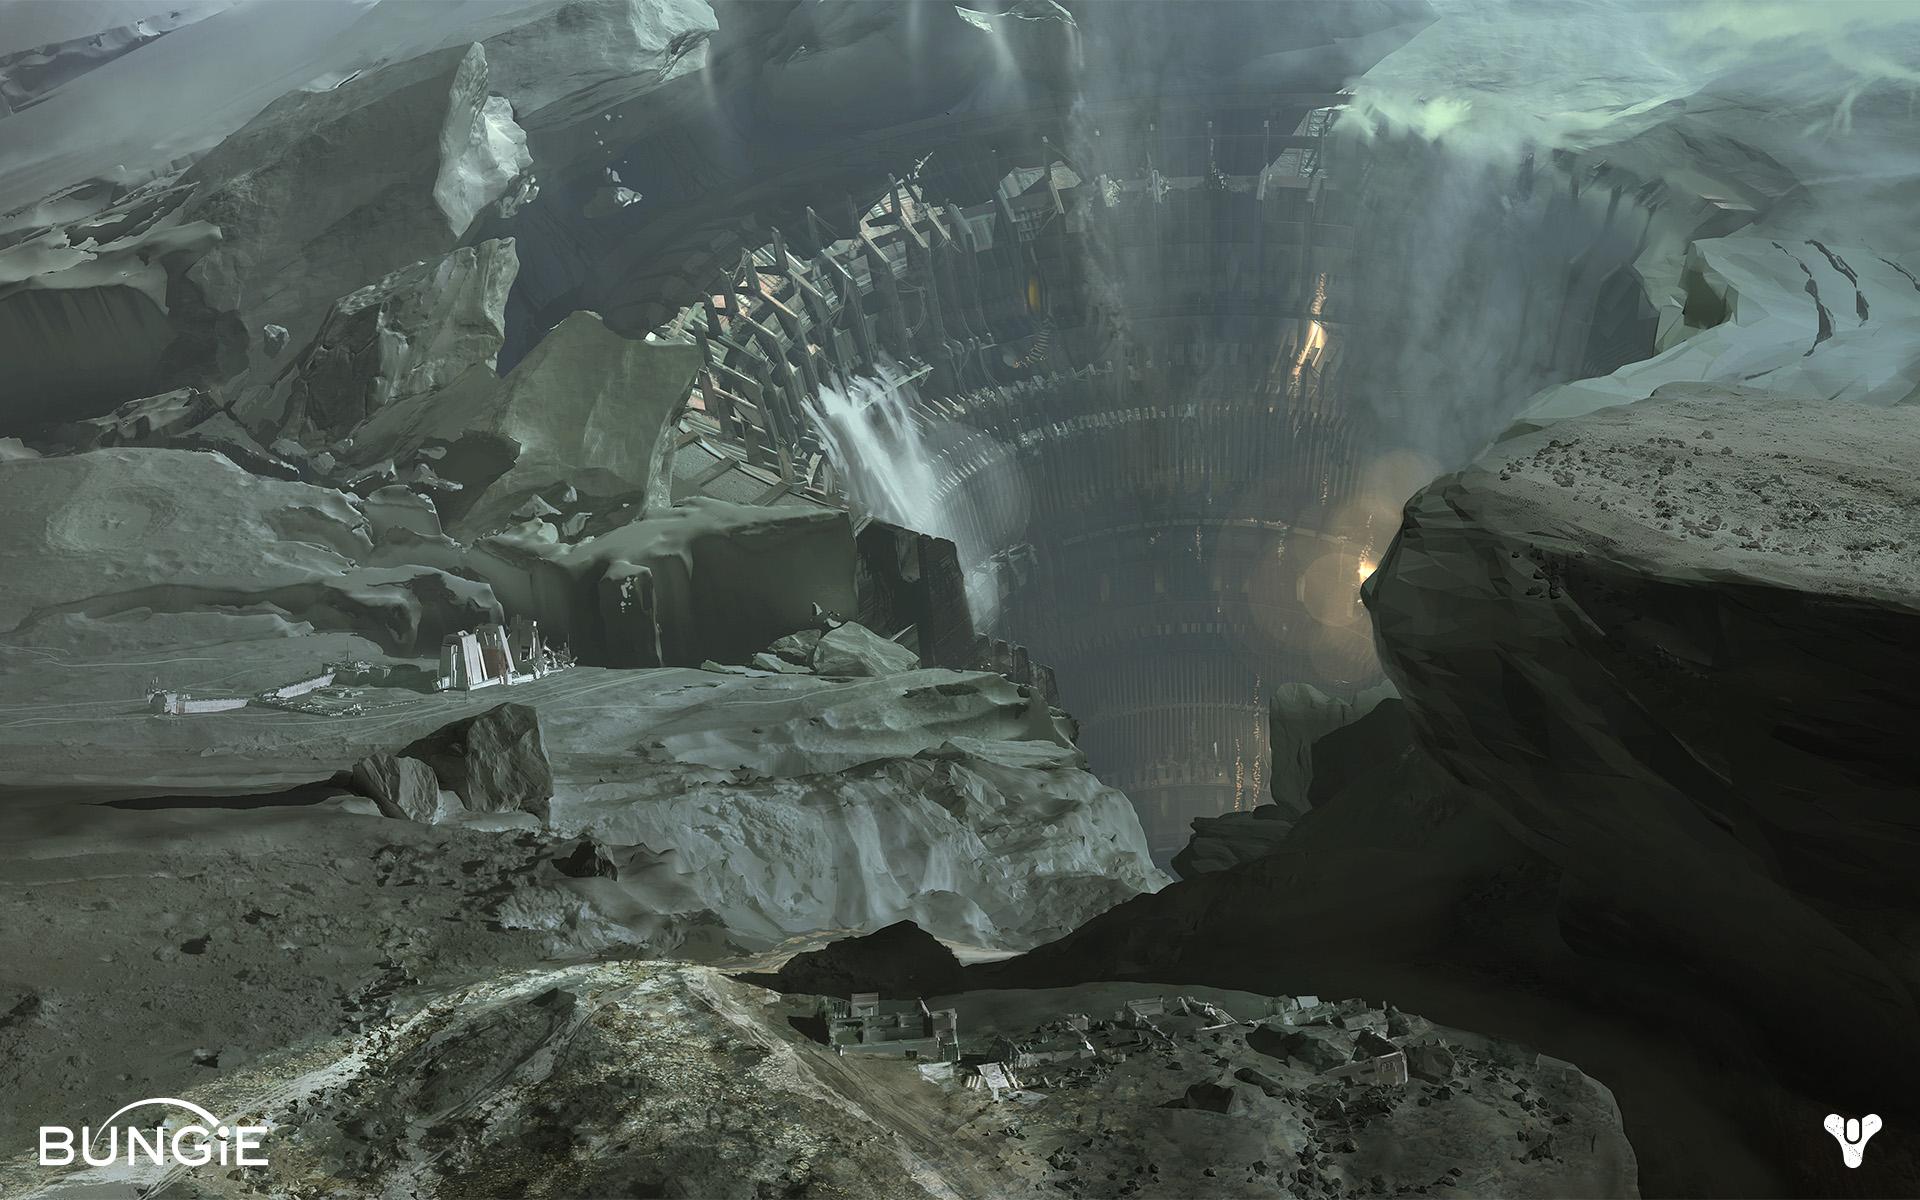 Destiny by Bungie Wallpapers - WallpaperSafari